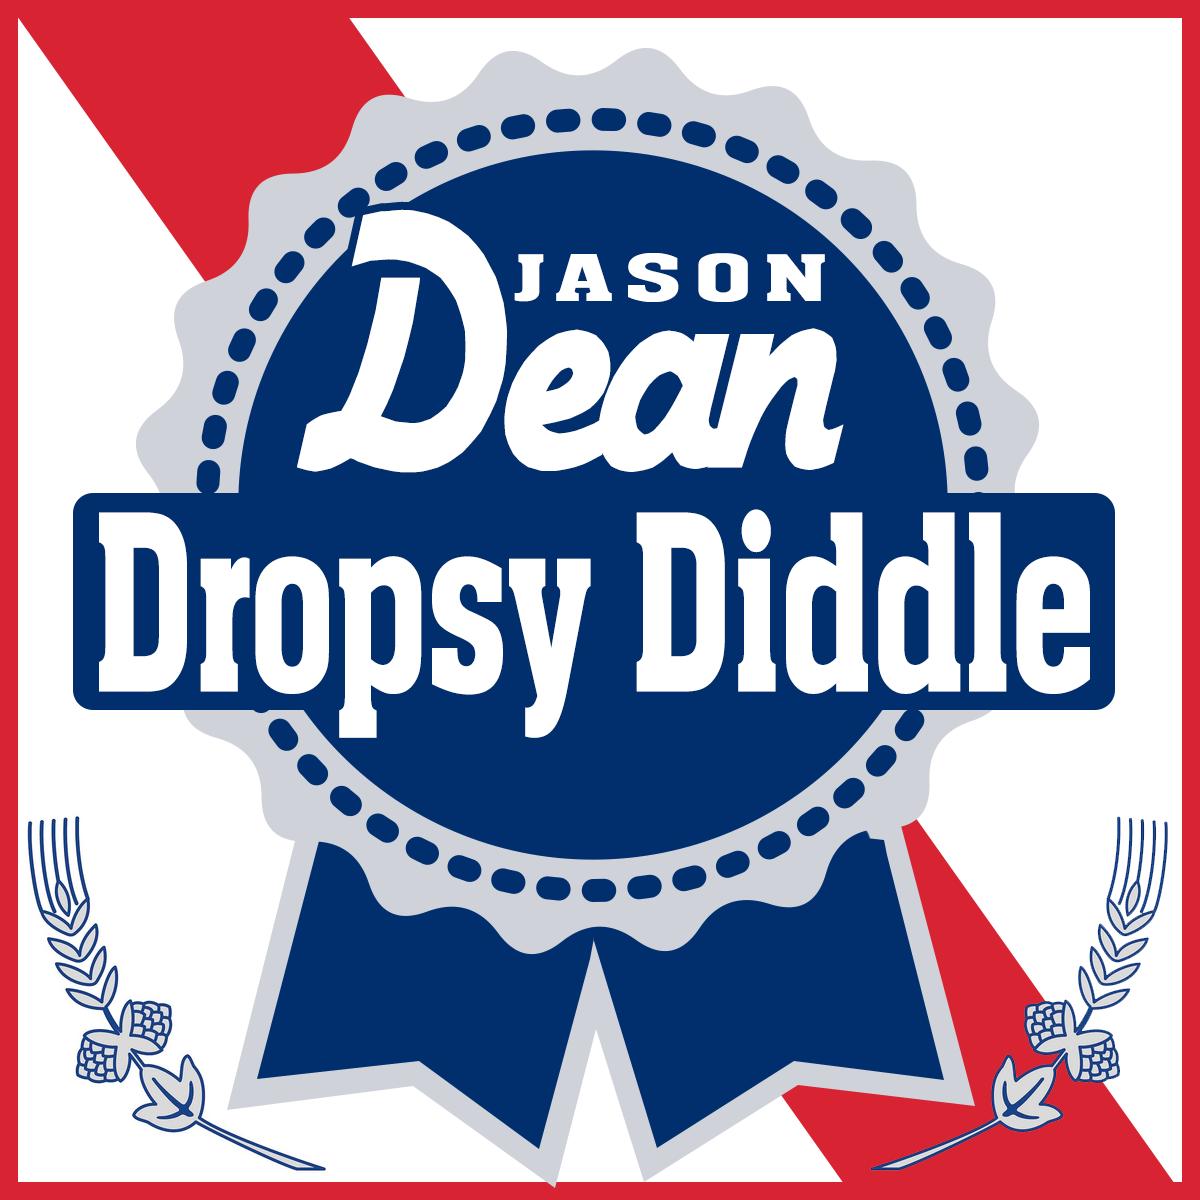 Dropsy Diddle by Jason Dean